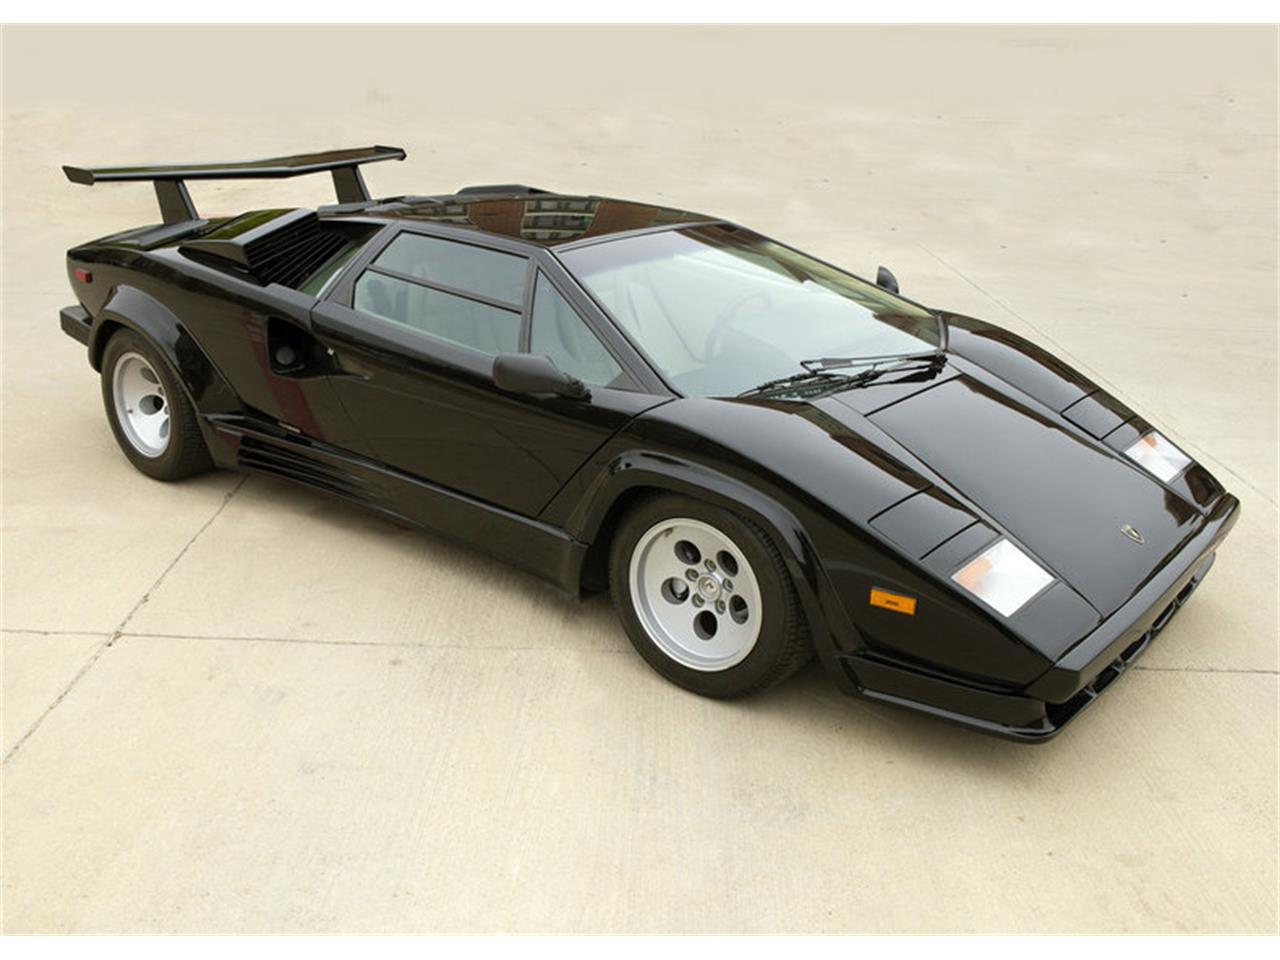 1988 Lamborghini Countach For Sale Classiccars Com Cc 968805